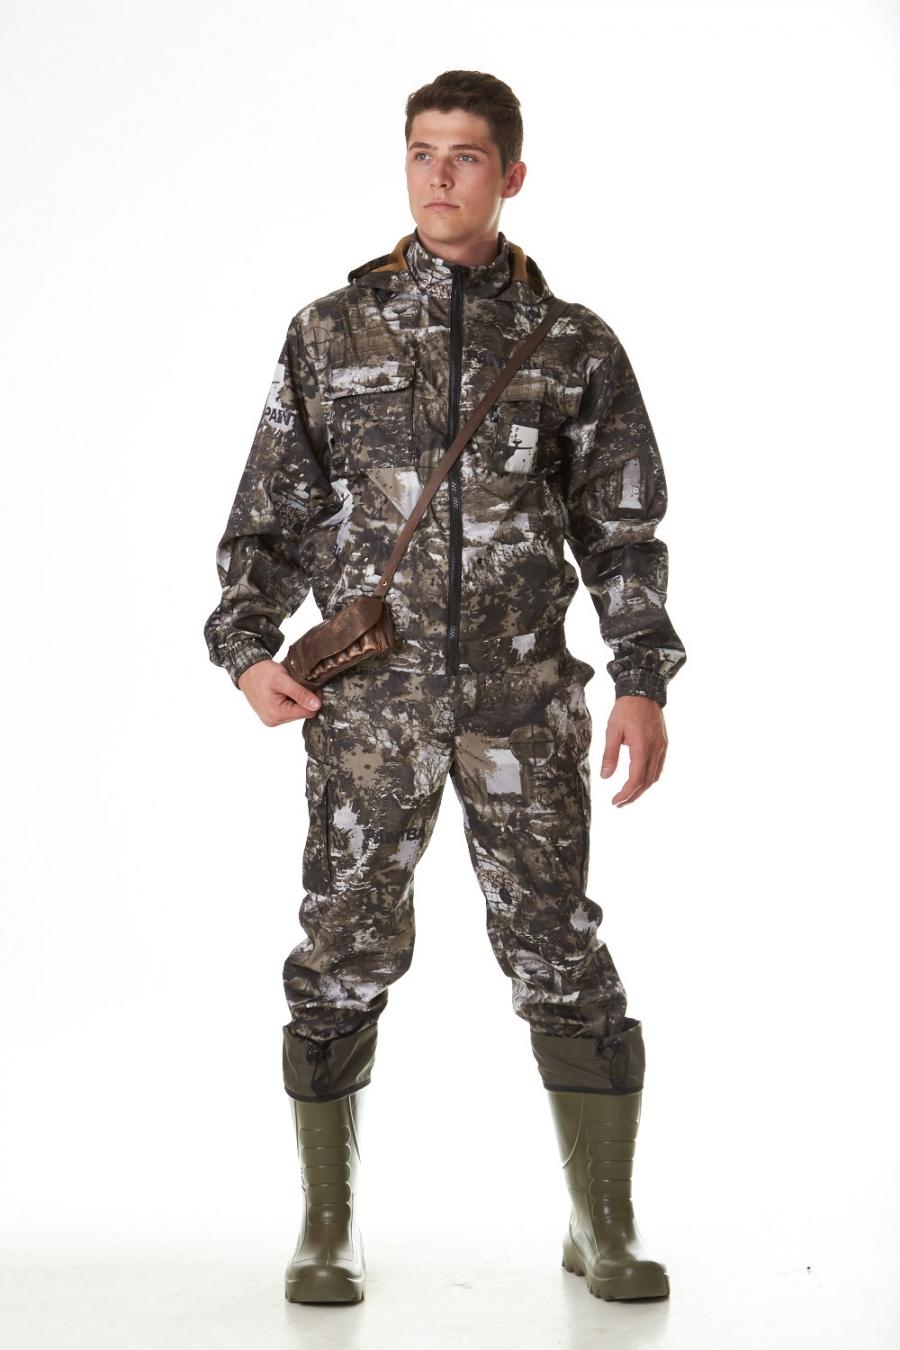 Костюм для охоты и рыбалки Лес-2Одежда для охоты и рыбалки<br><br><br>Размер: 64